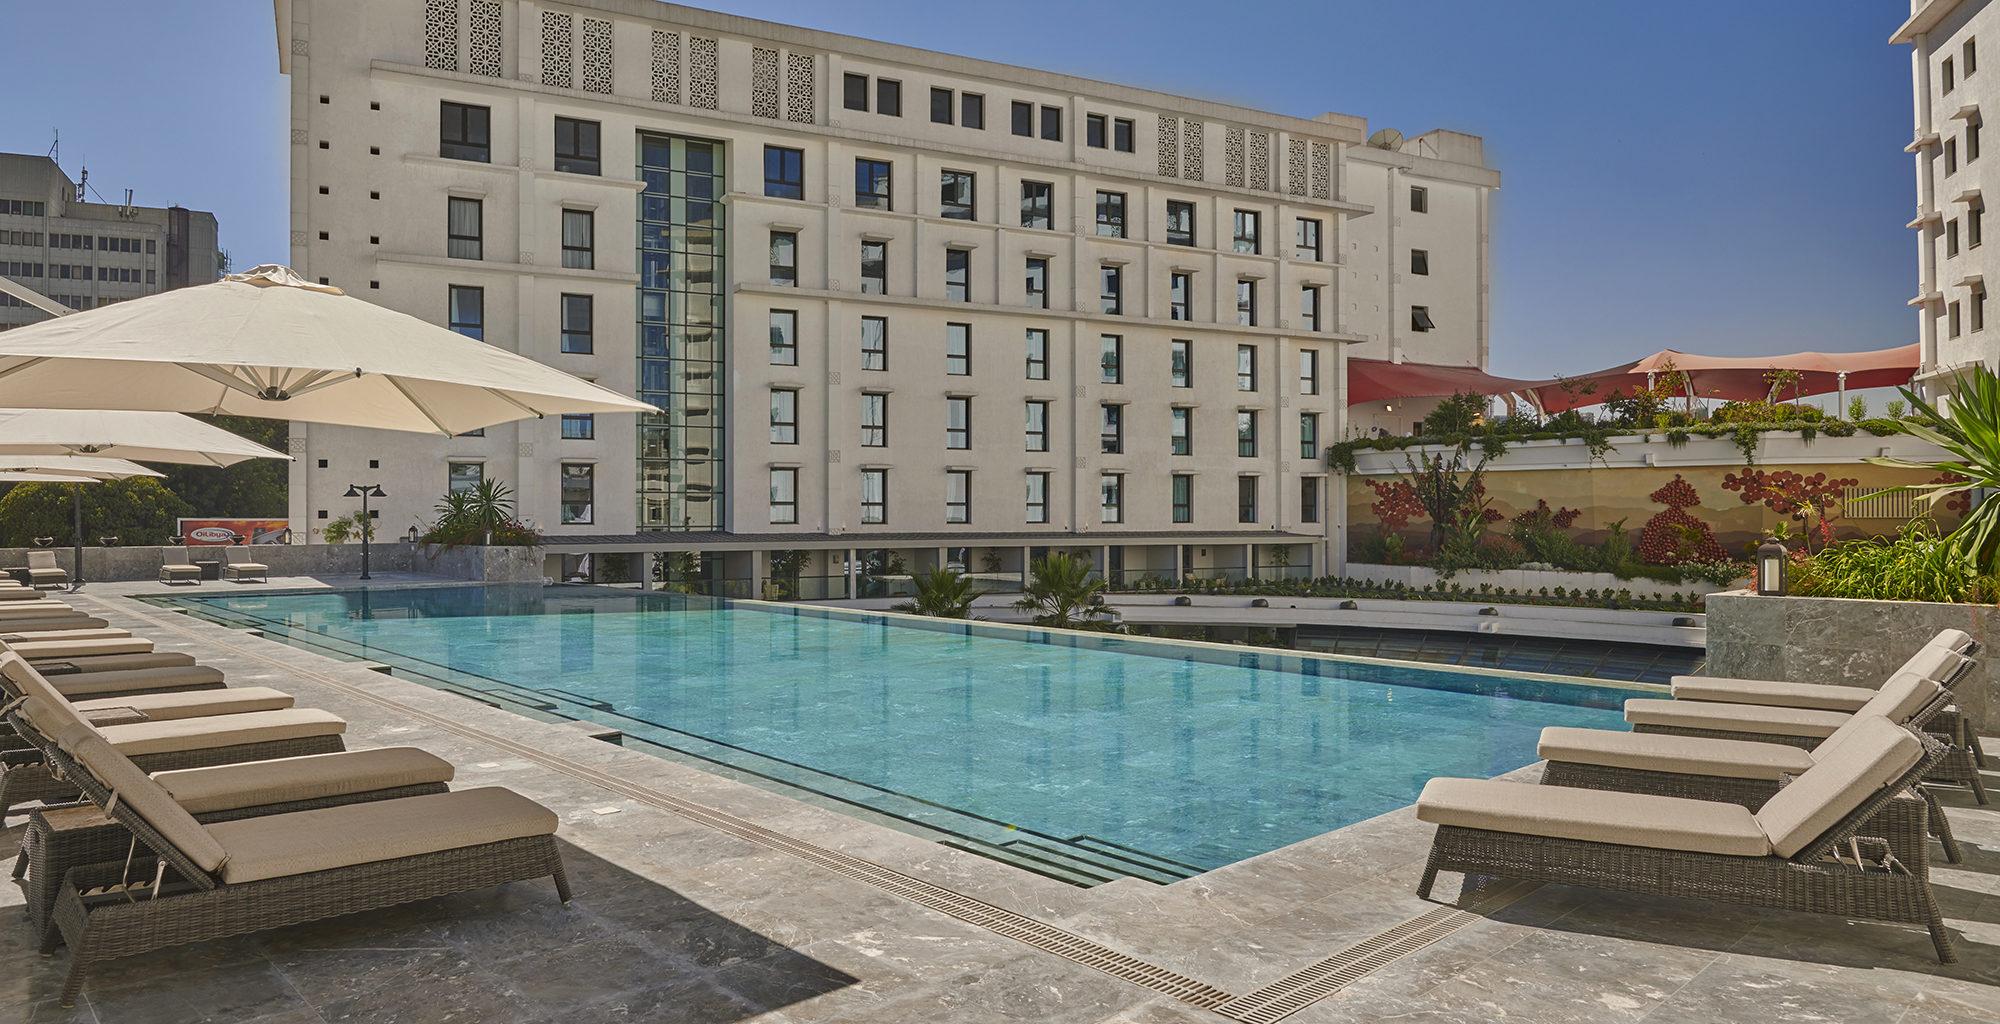 Ethiopia-Hyatt-Regency-Addis-Ababa-Pool